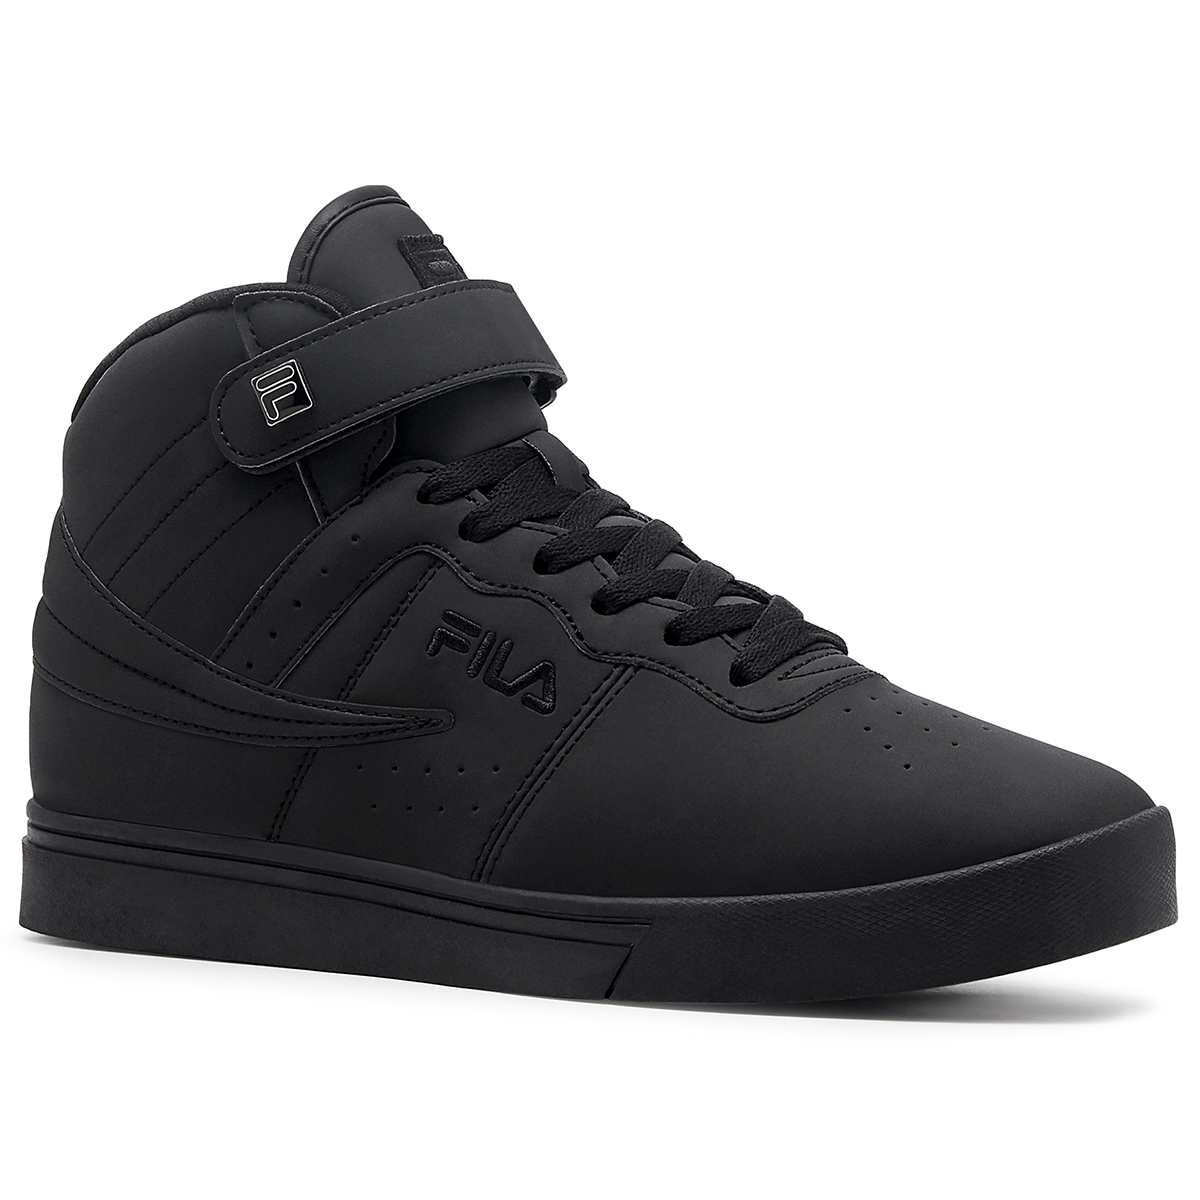 Fila Men's Vulc 13 Mid Basketball Shoes - Black, 12